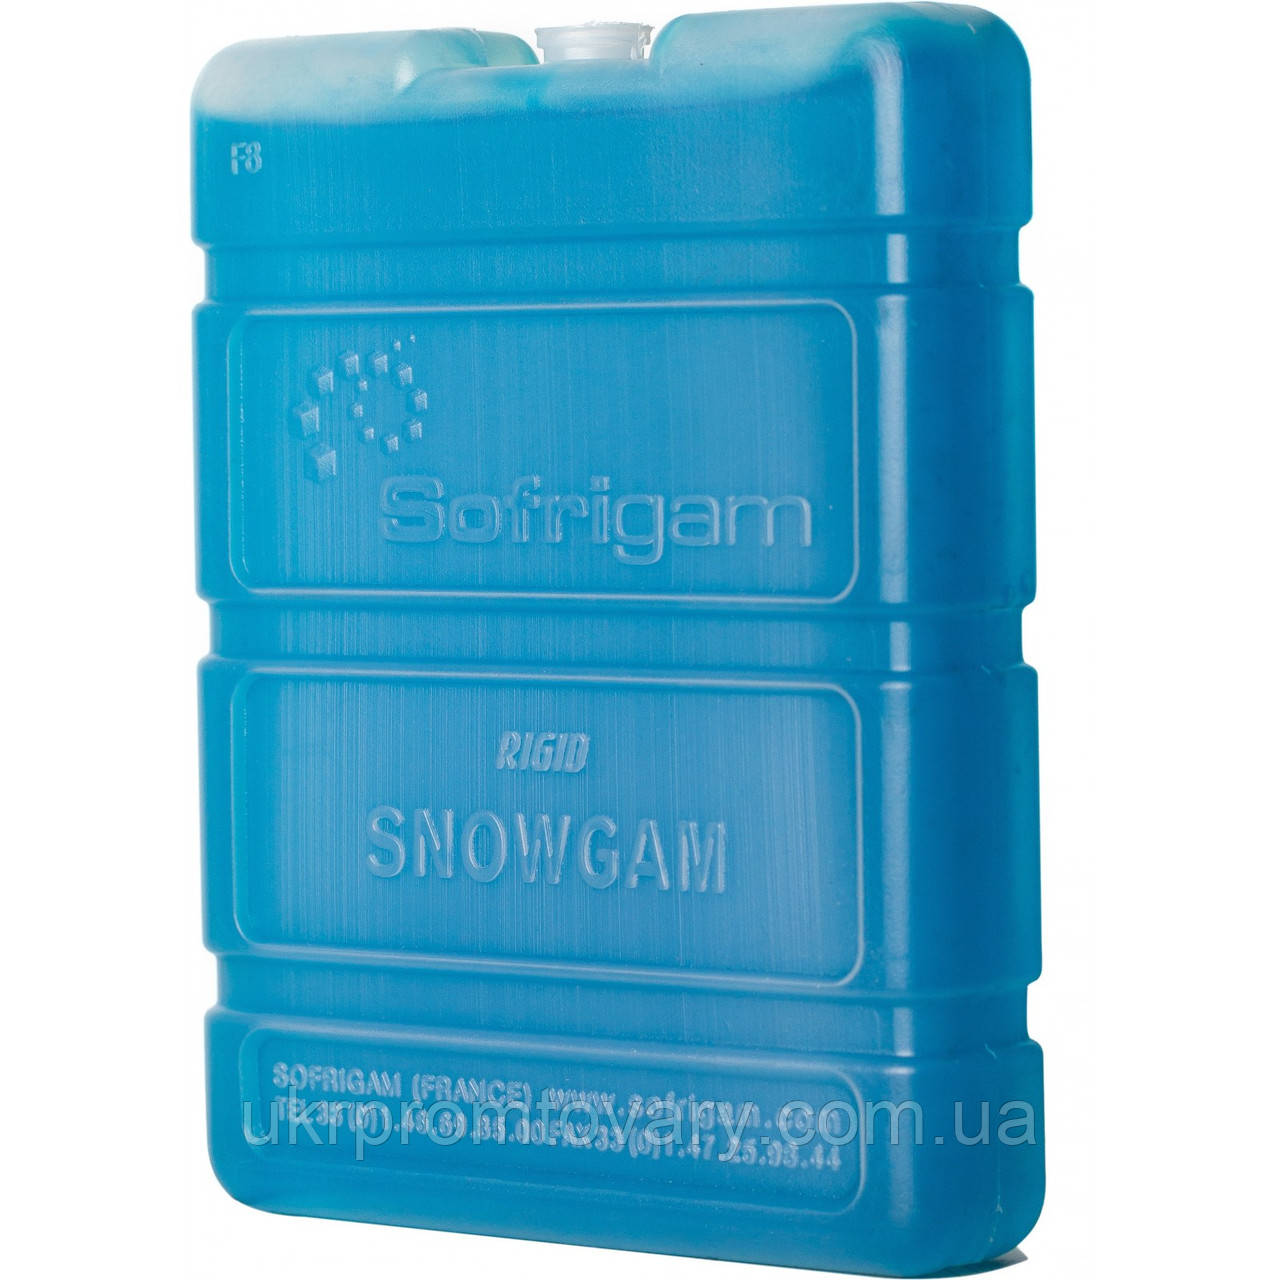 Аккумулятор холода Sofrigam PER1015N Франция!! БОЛЬШОЙ - 820 грамм